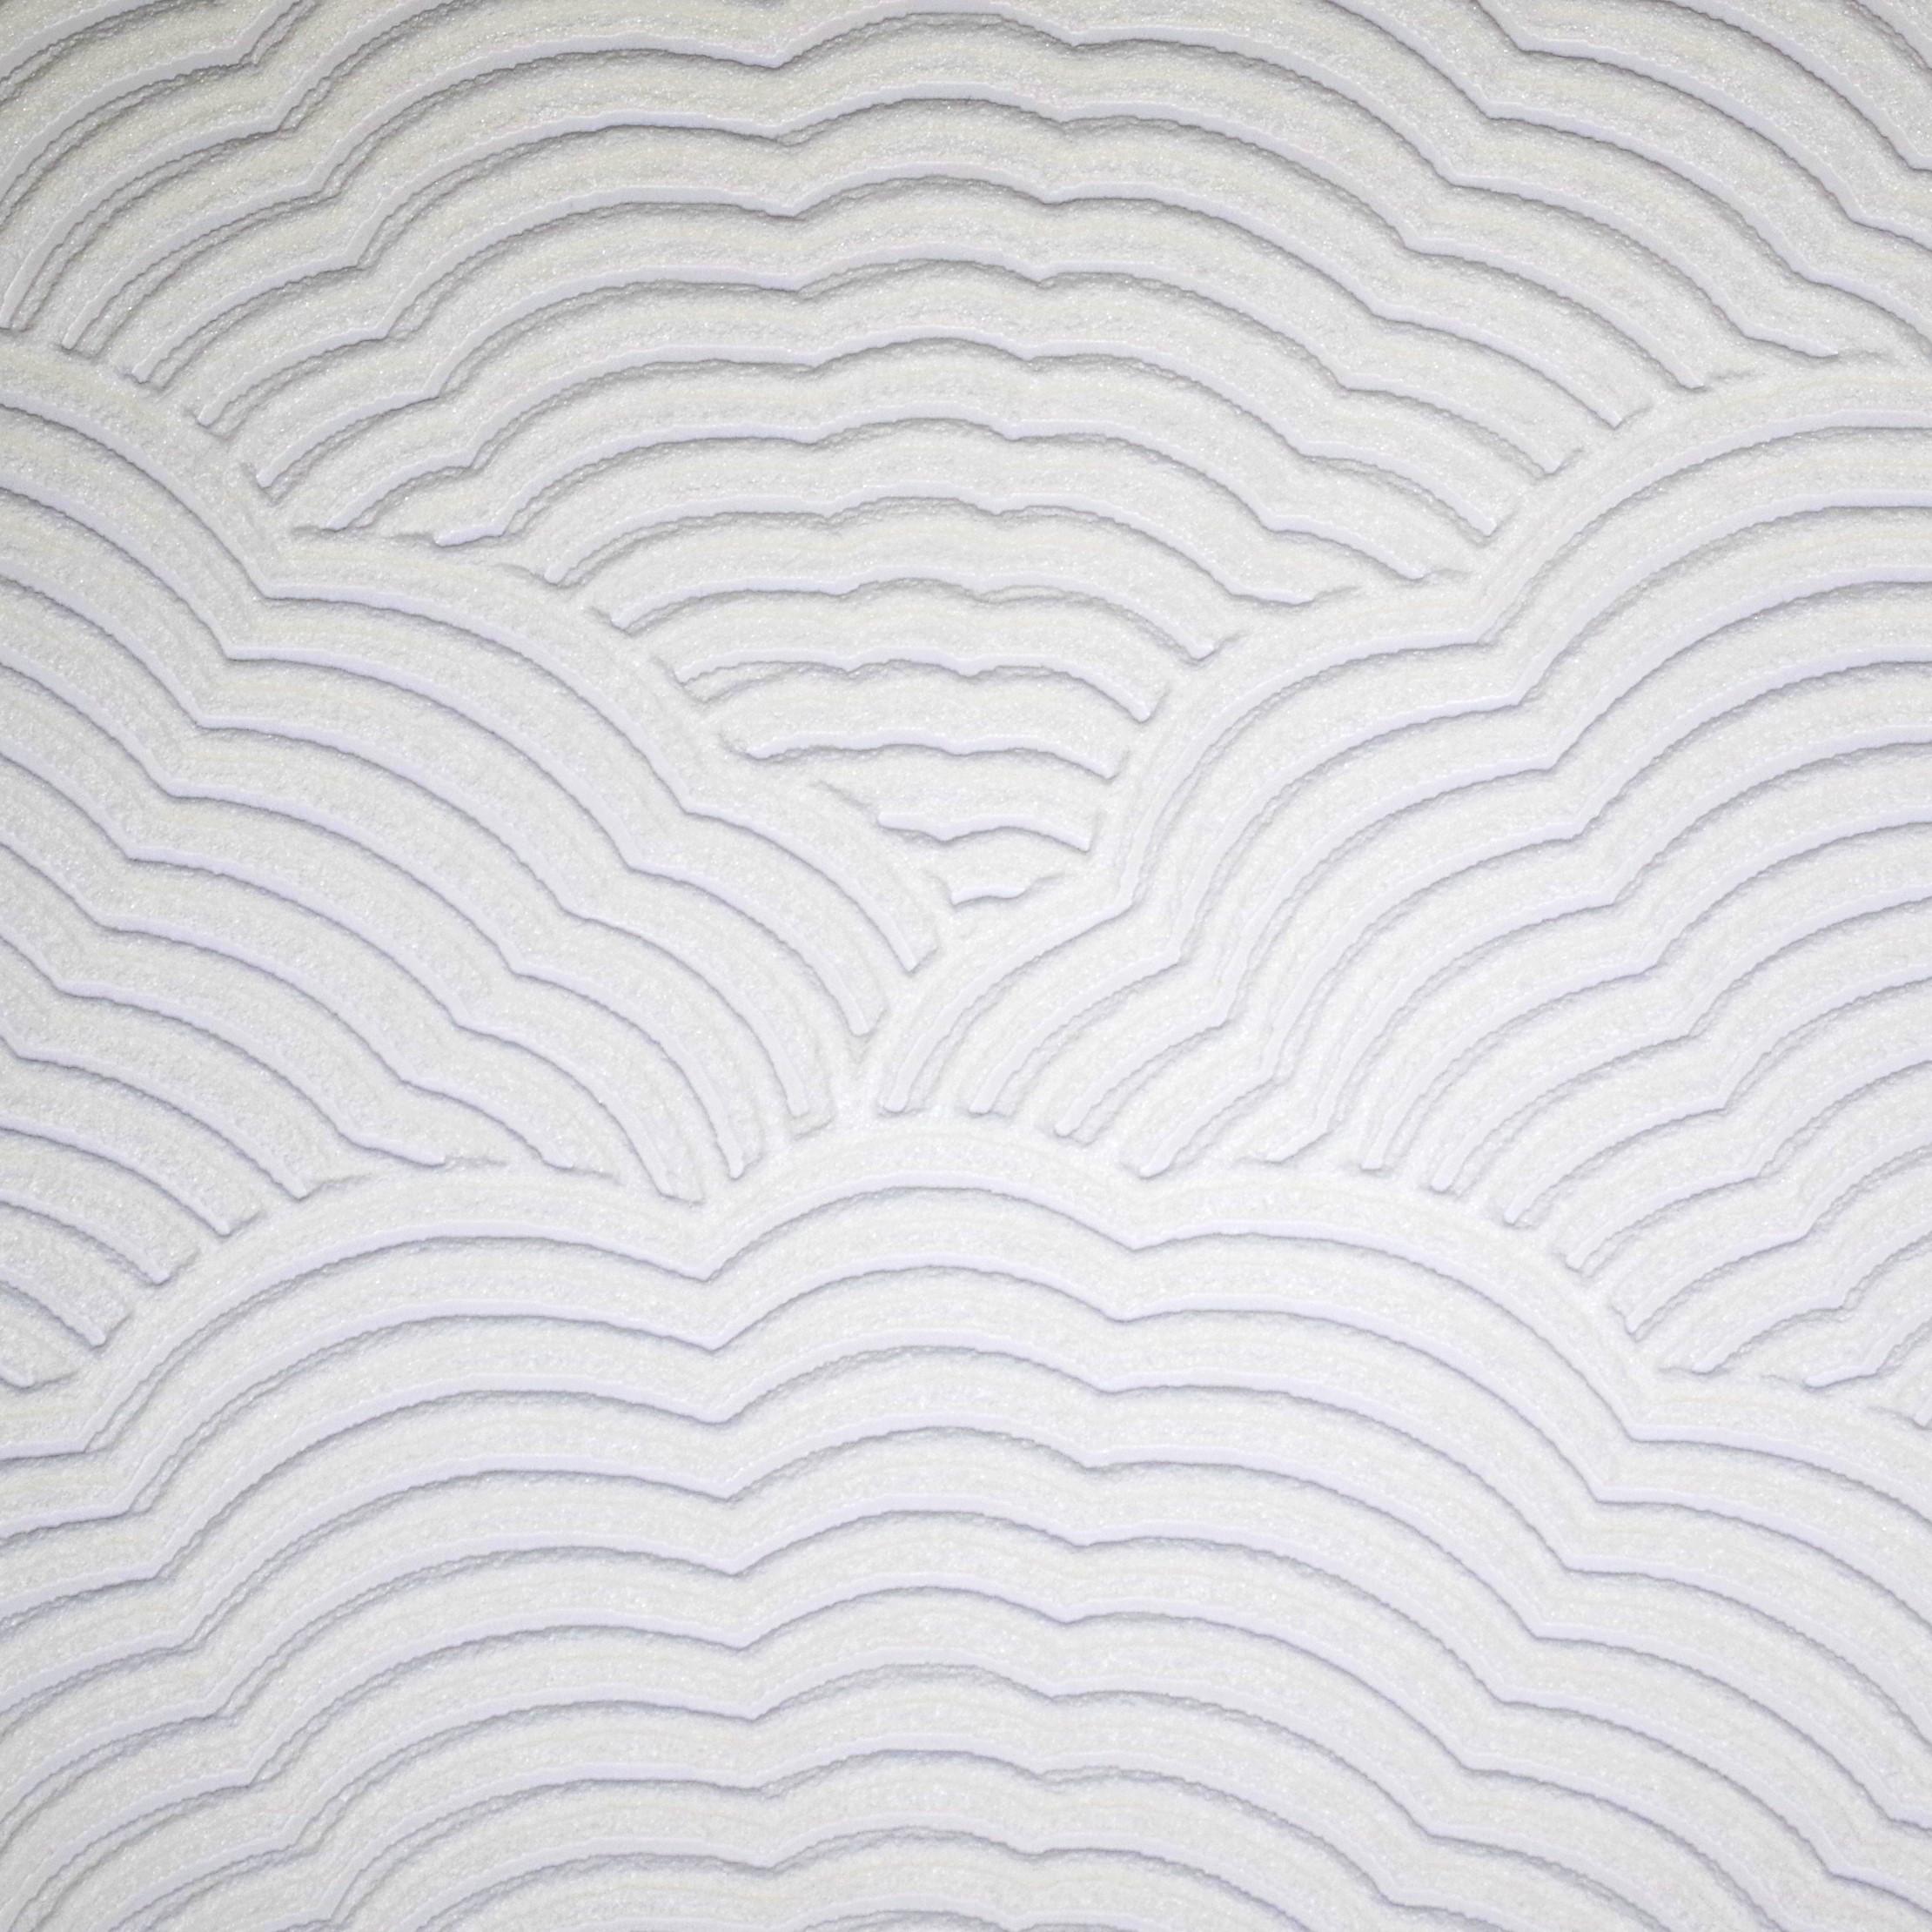 Belgravia Richmond Artex Textured Blown Vinyl Wallpaper 5807